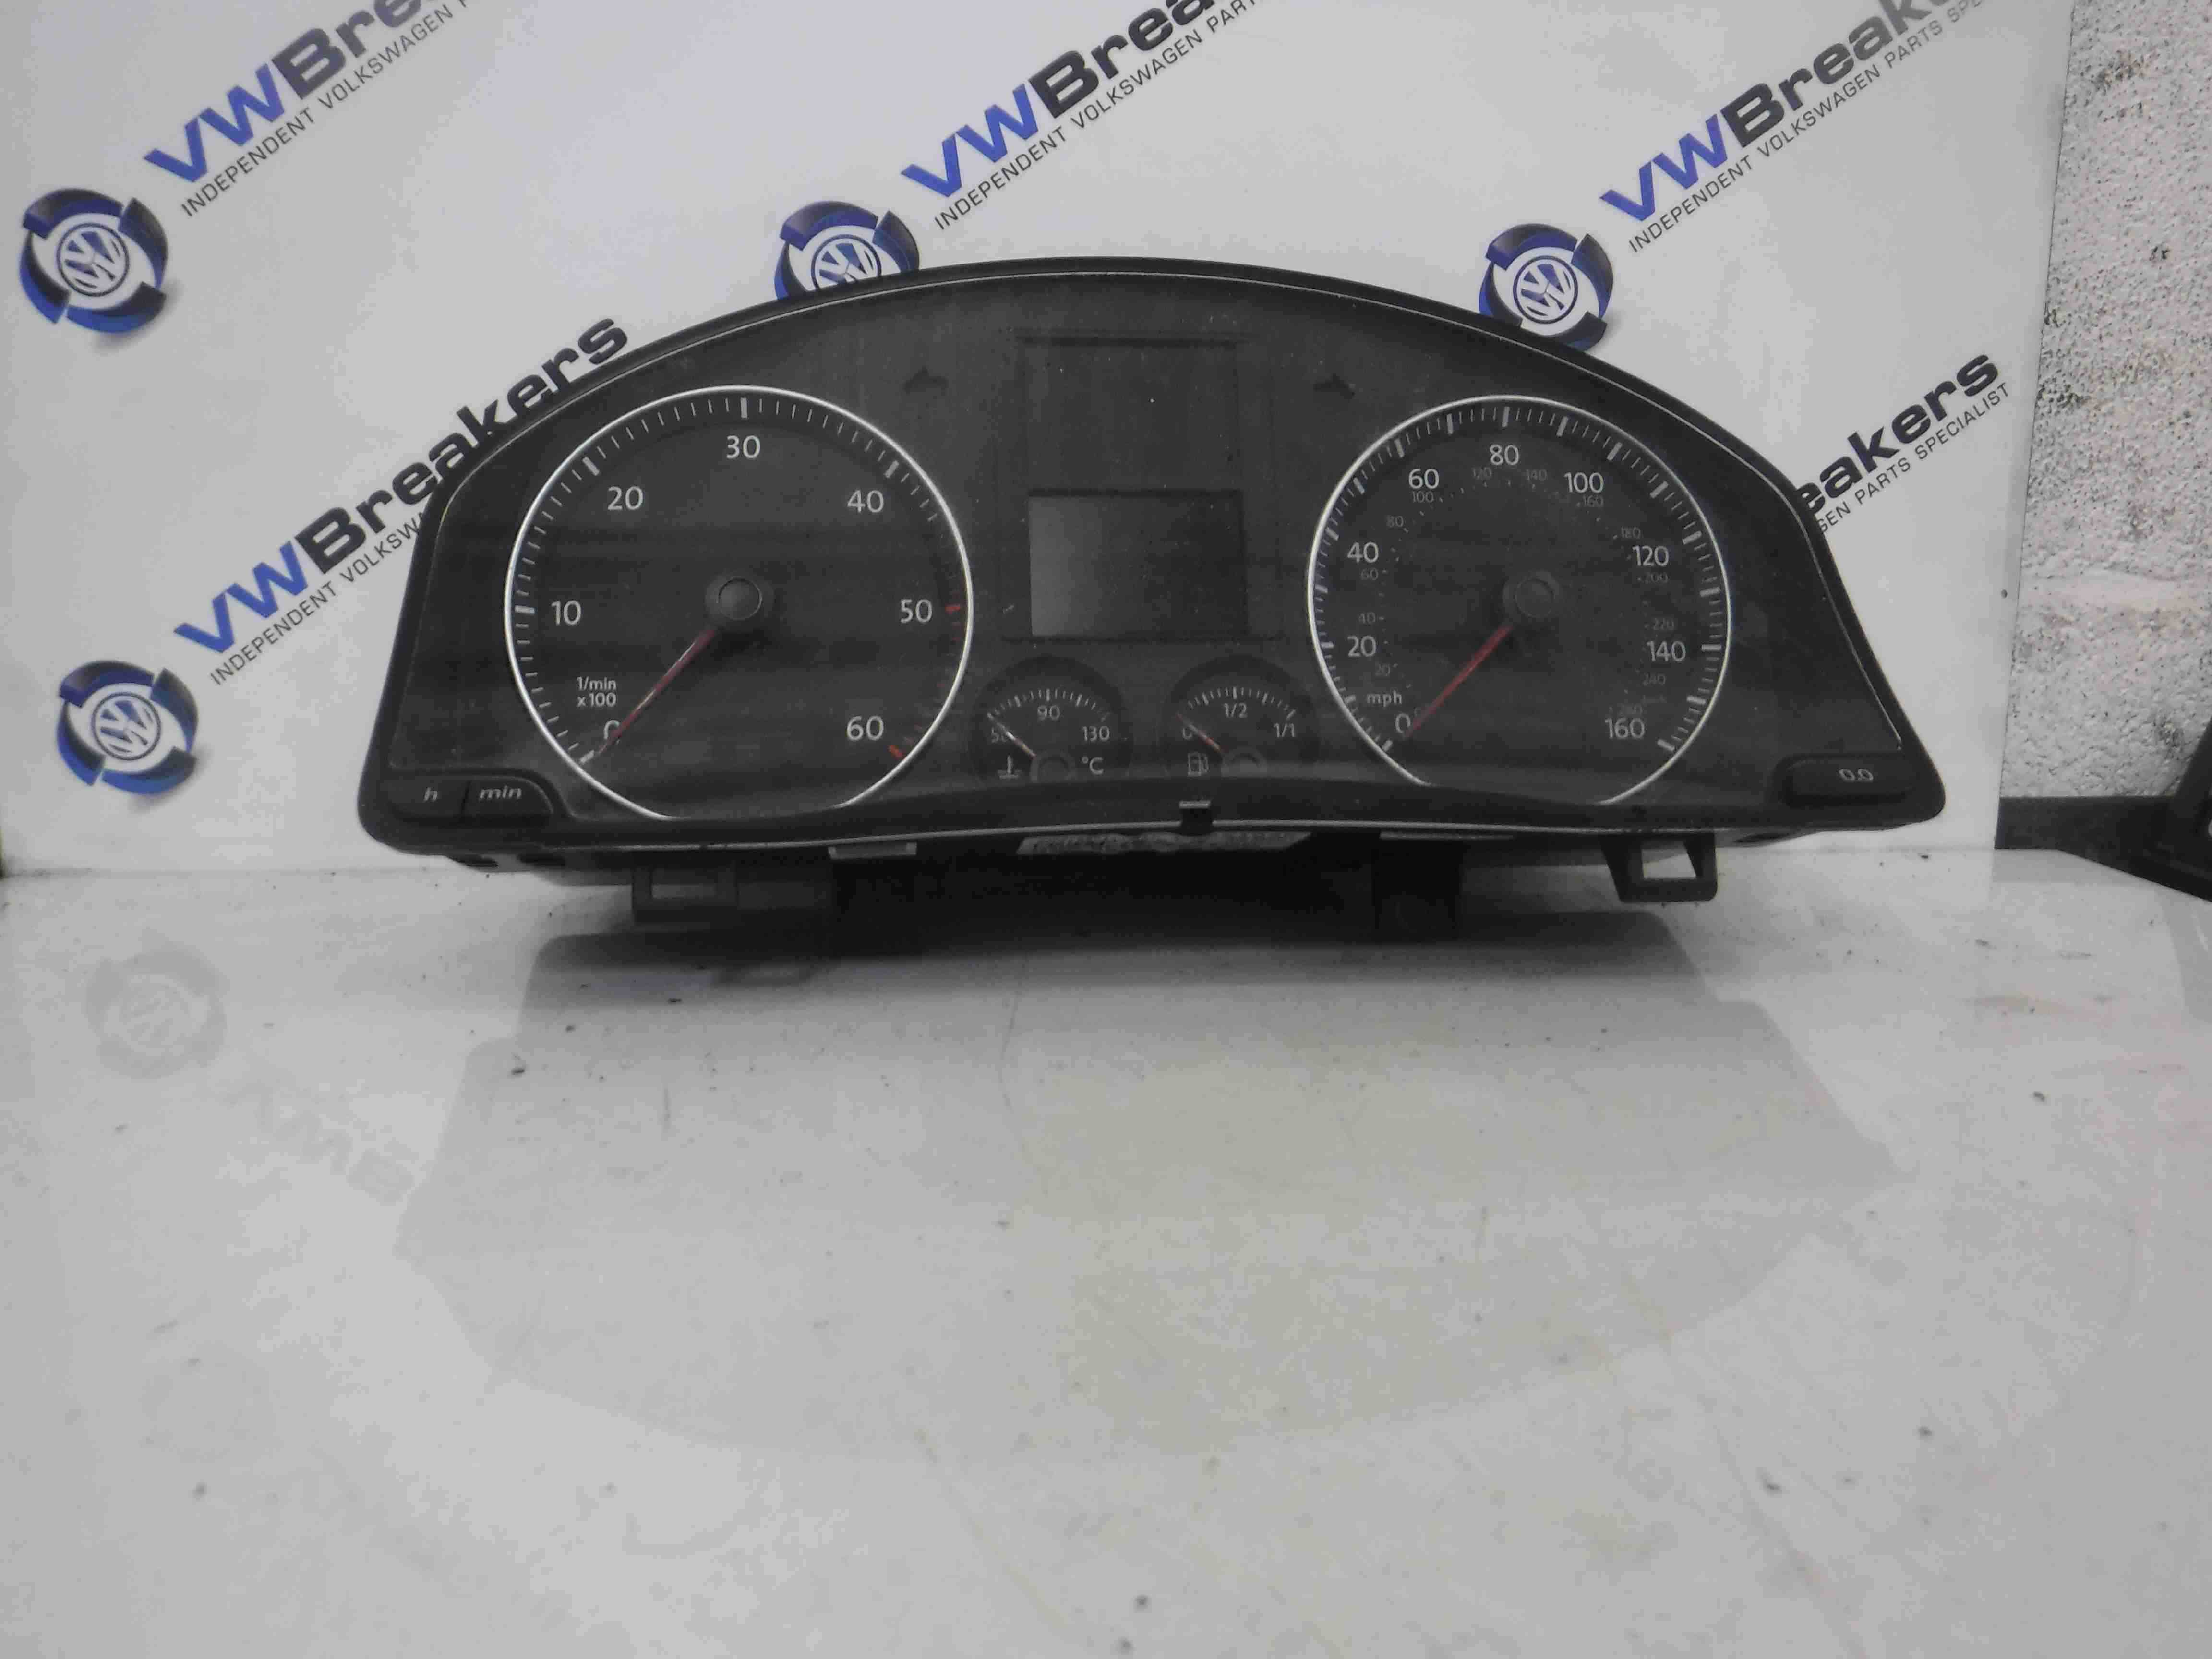 Volkswagen Golf MK5 2003-2009 Instrument Panel Clocks Cluster Gauges 186K